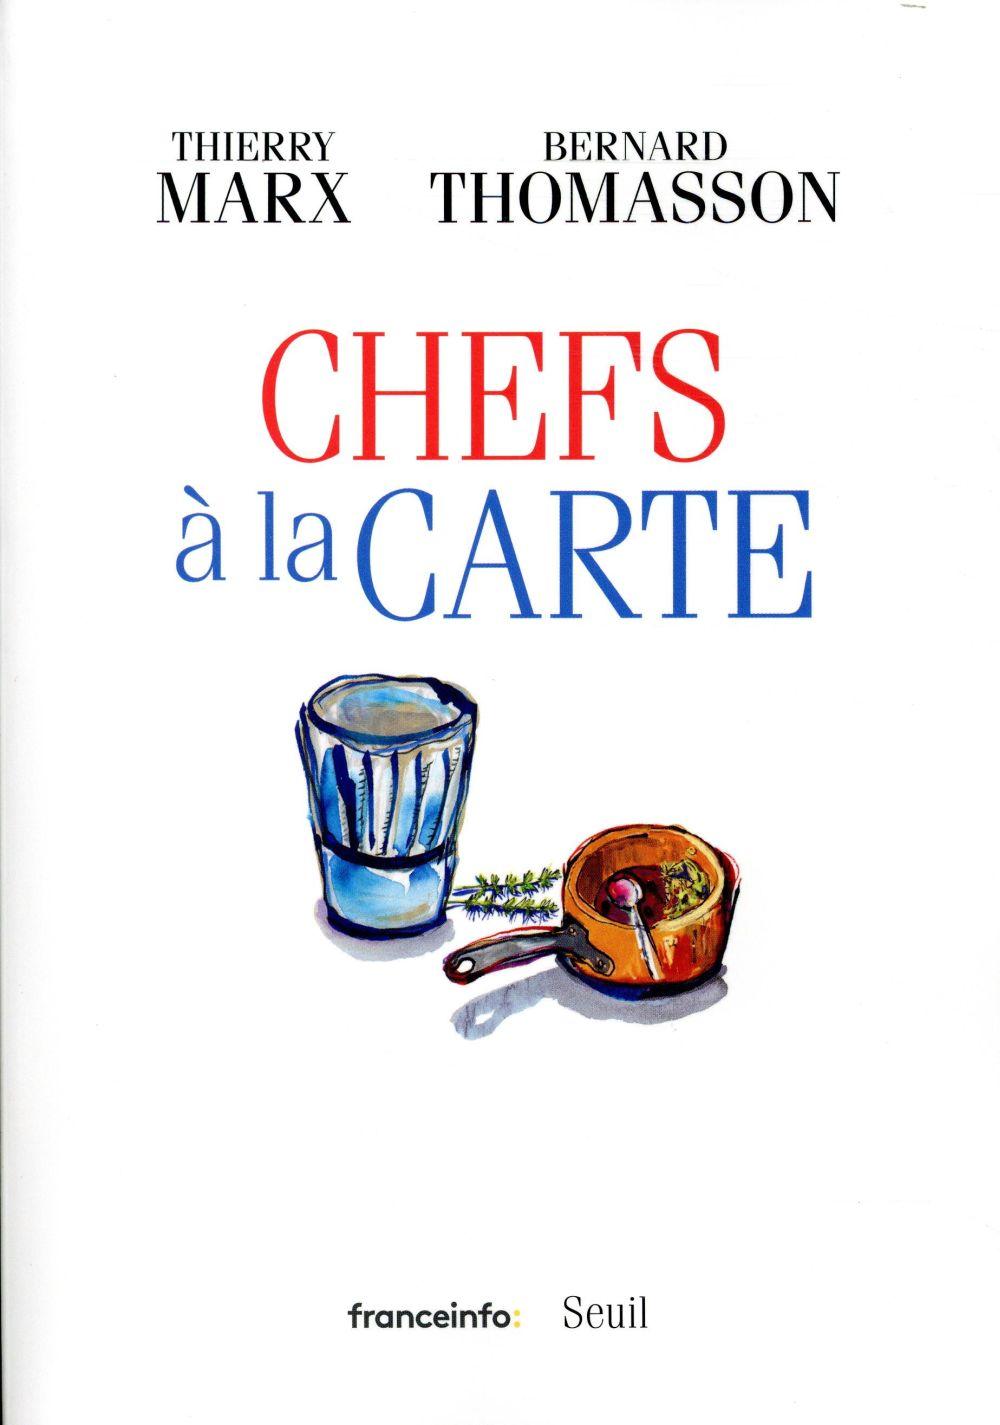 CHEFS A LA CARTE